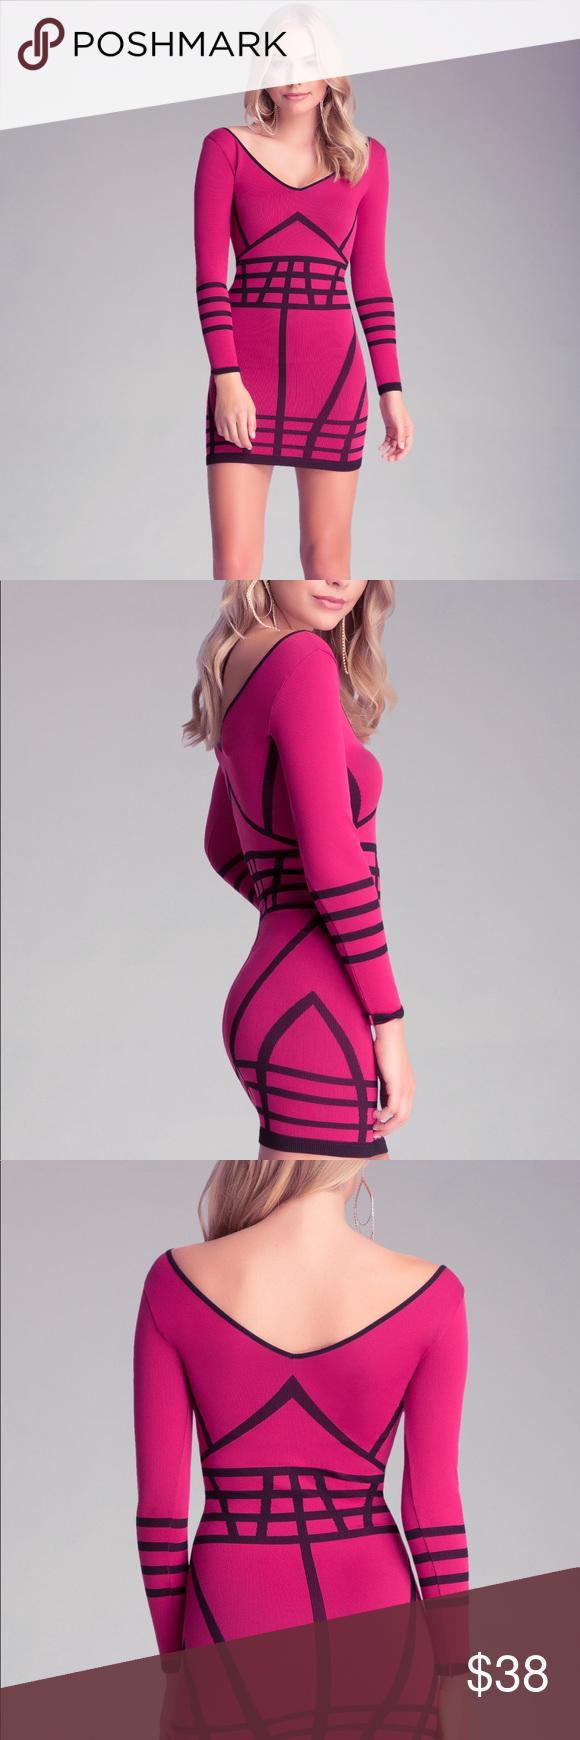 Bebe pinkblack long sleeve bodycon dress nwt black body body con